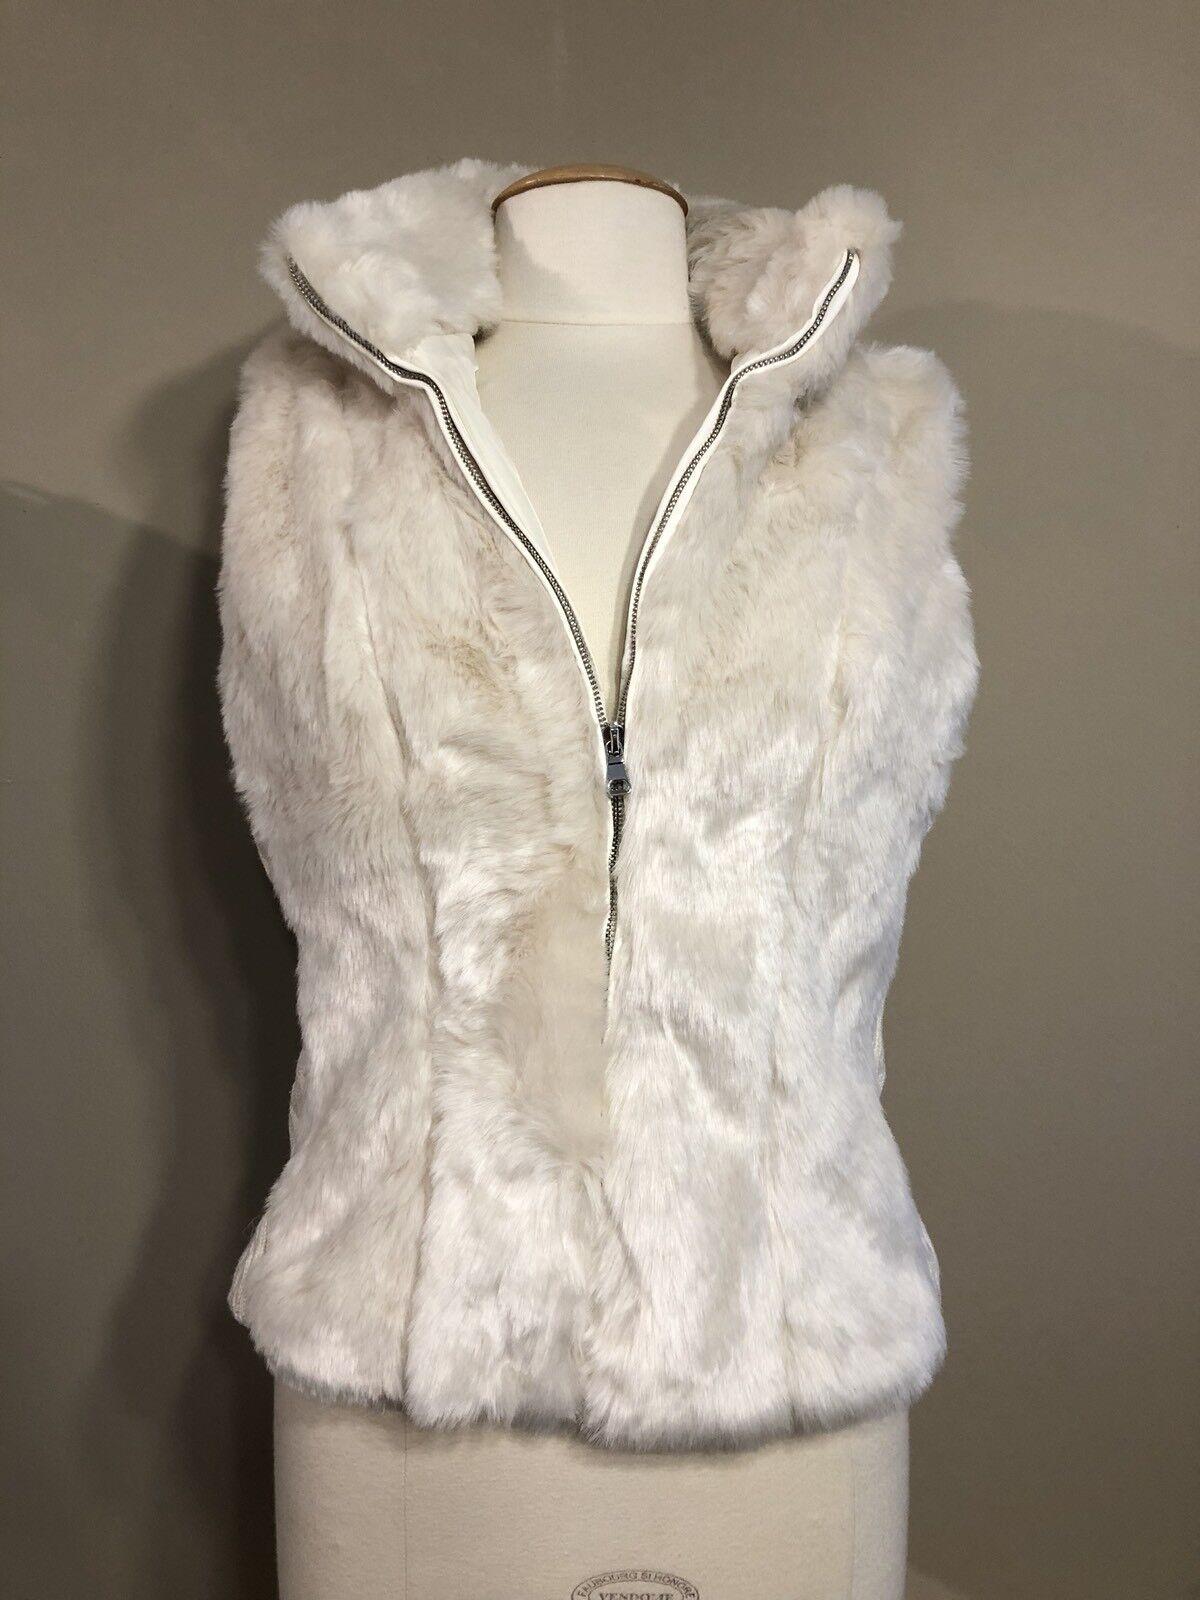 New Cavalini Off-White Faux Fur Sleeveless Vest Women Size PL Petite Large